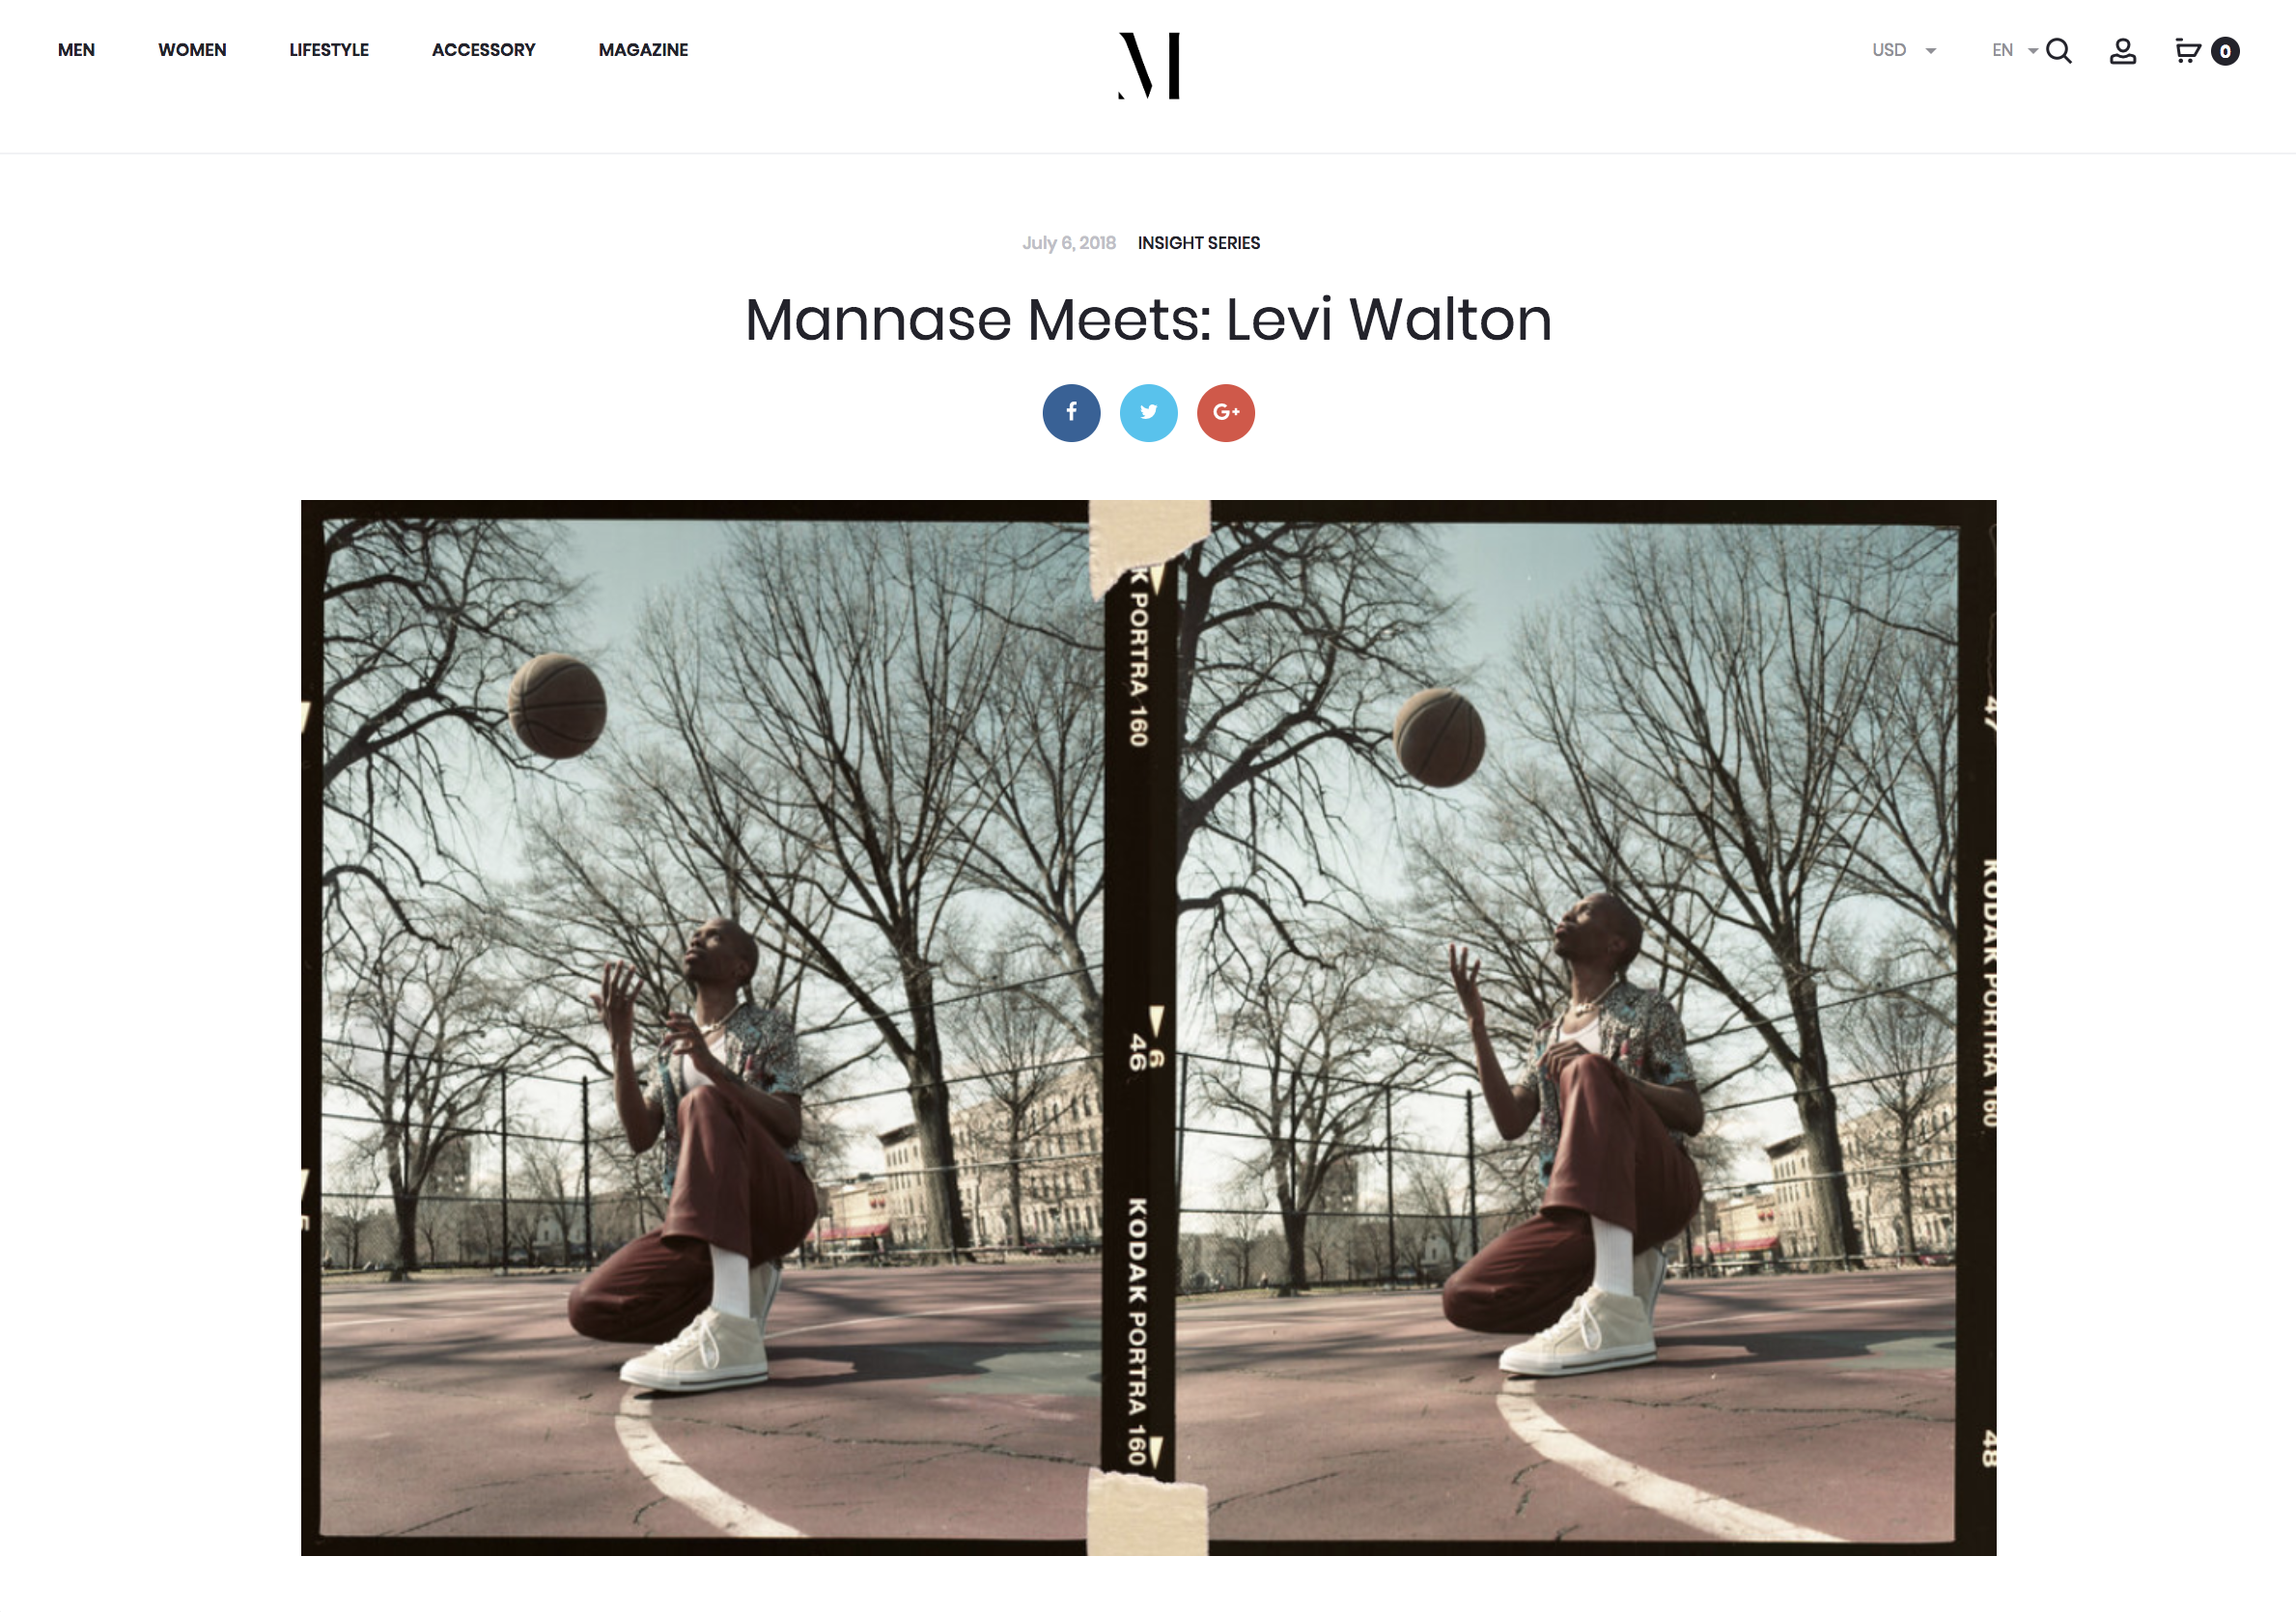 Mannase Meets: Levi Walton